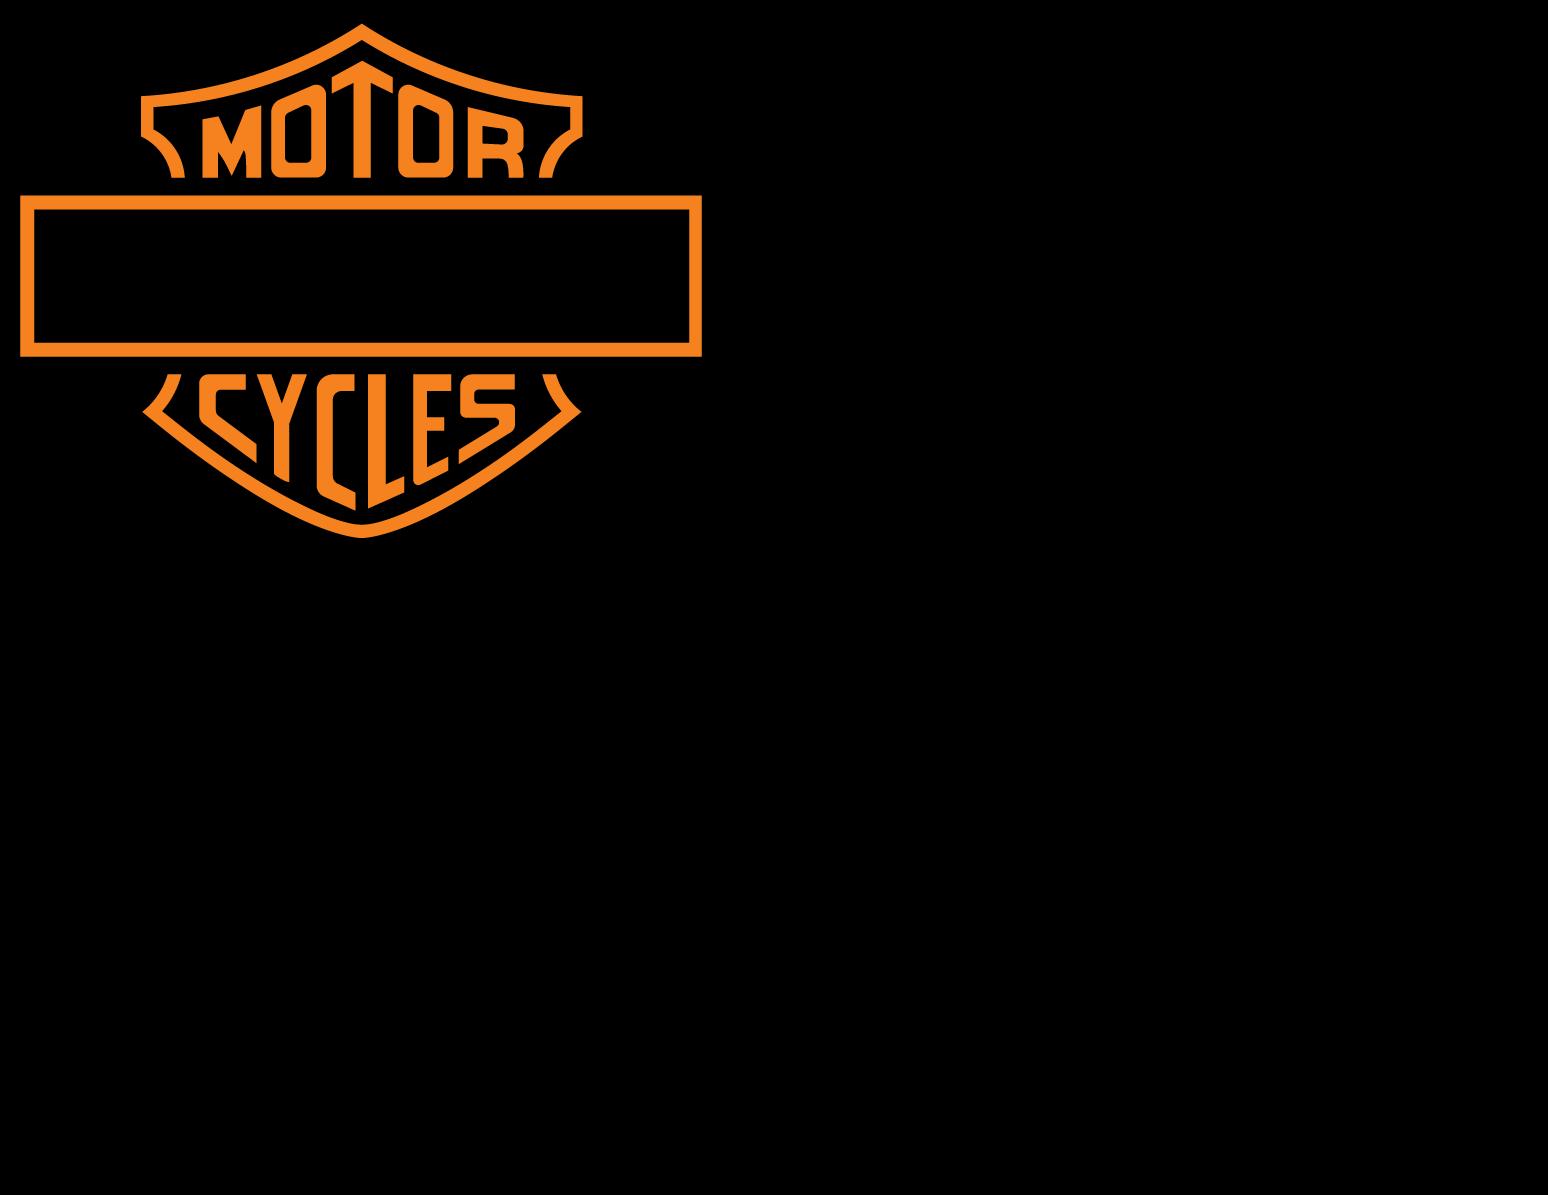 photograph relating to Printable Harley Davidson Logo named Harley Davidson Brand Stencil Vector FreePatternsArea